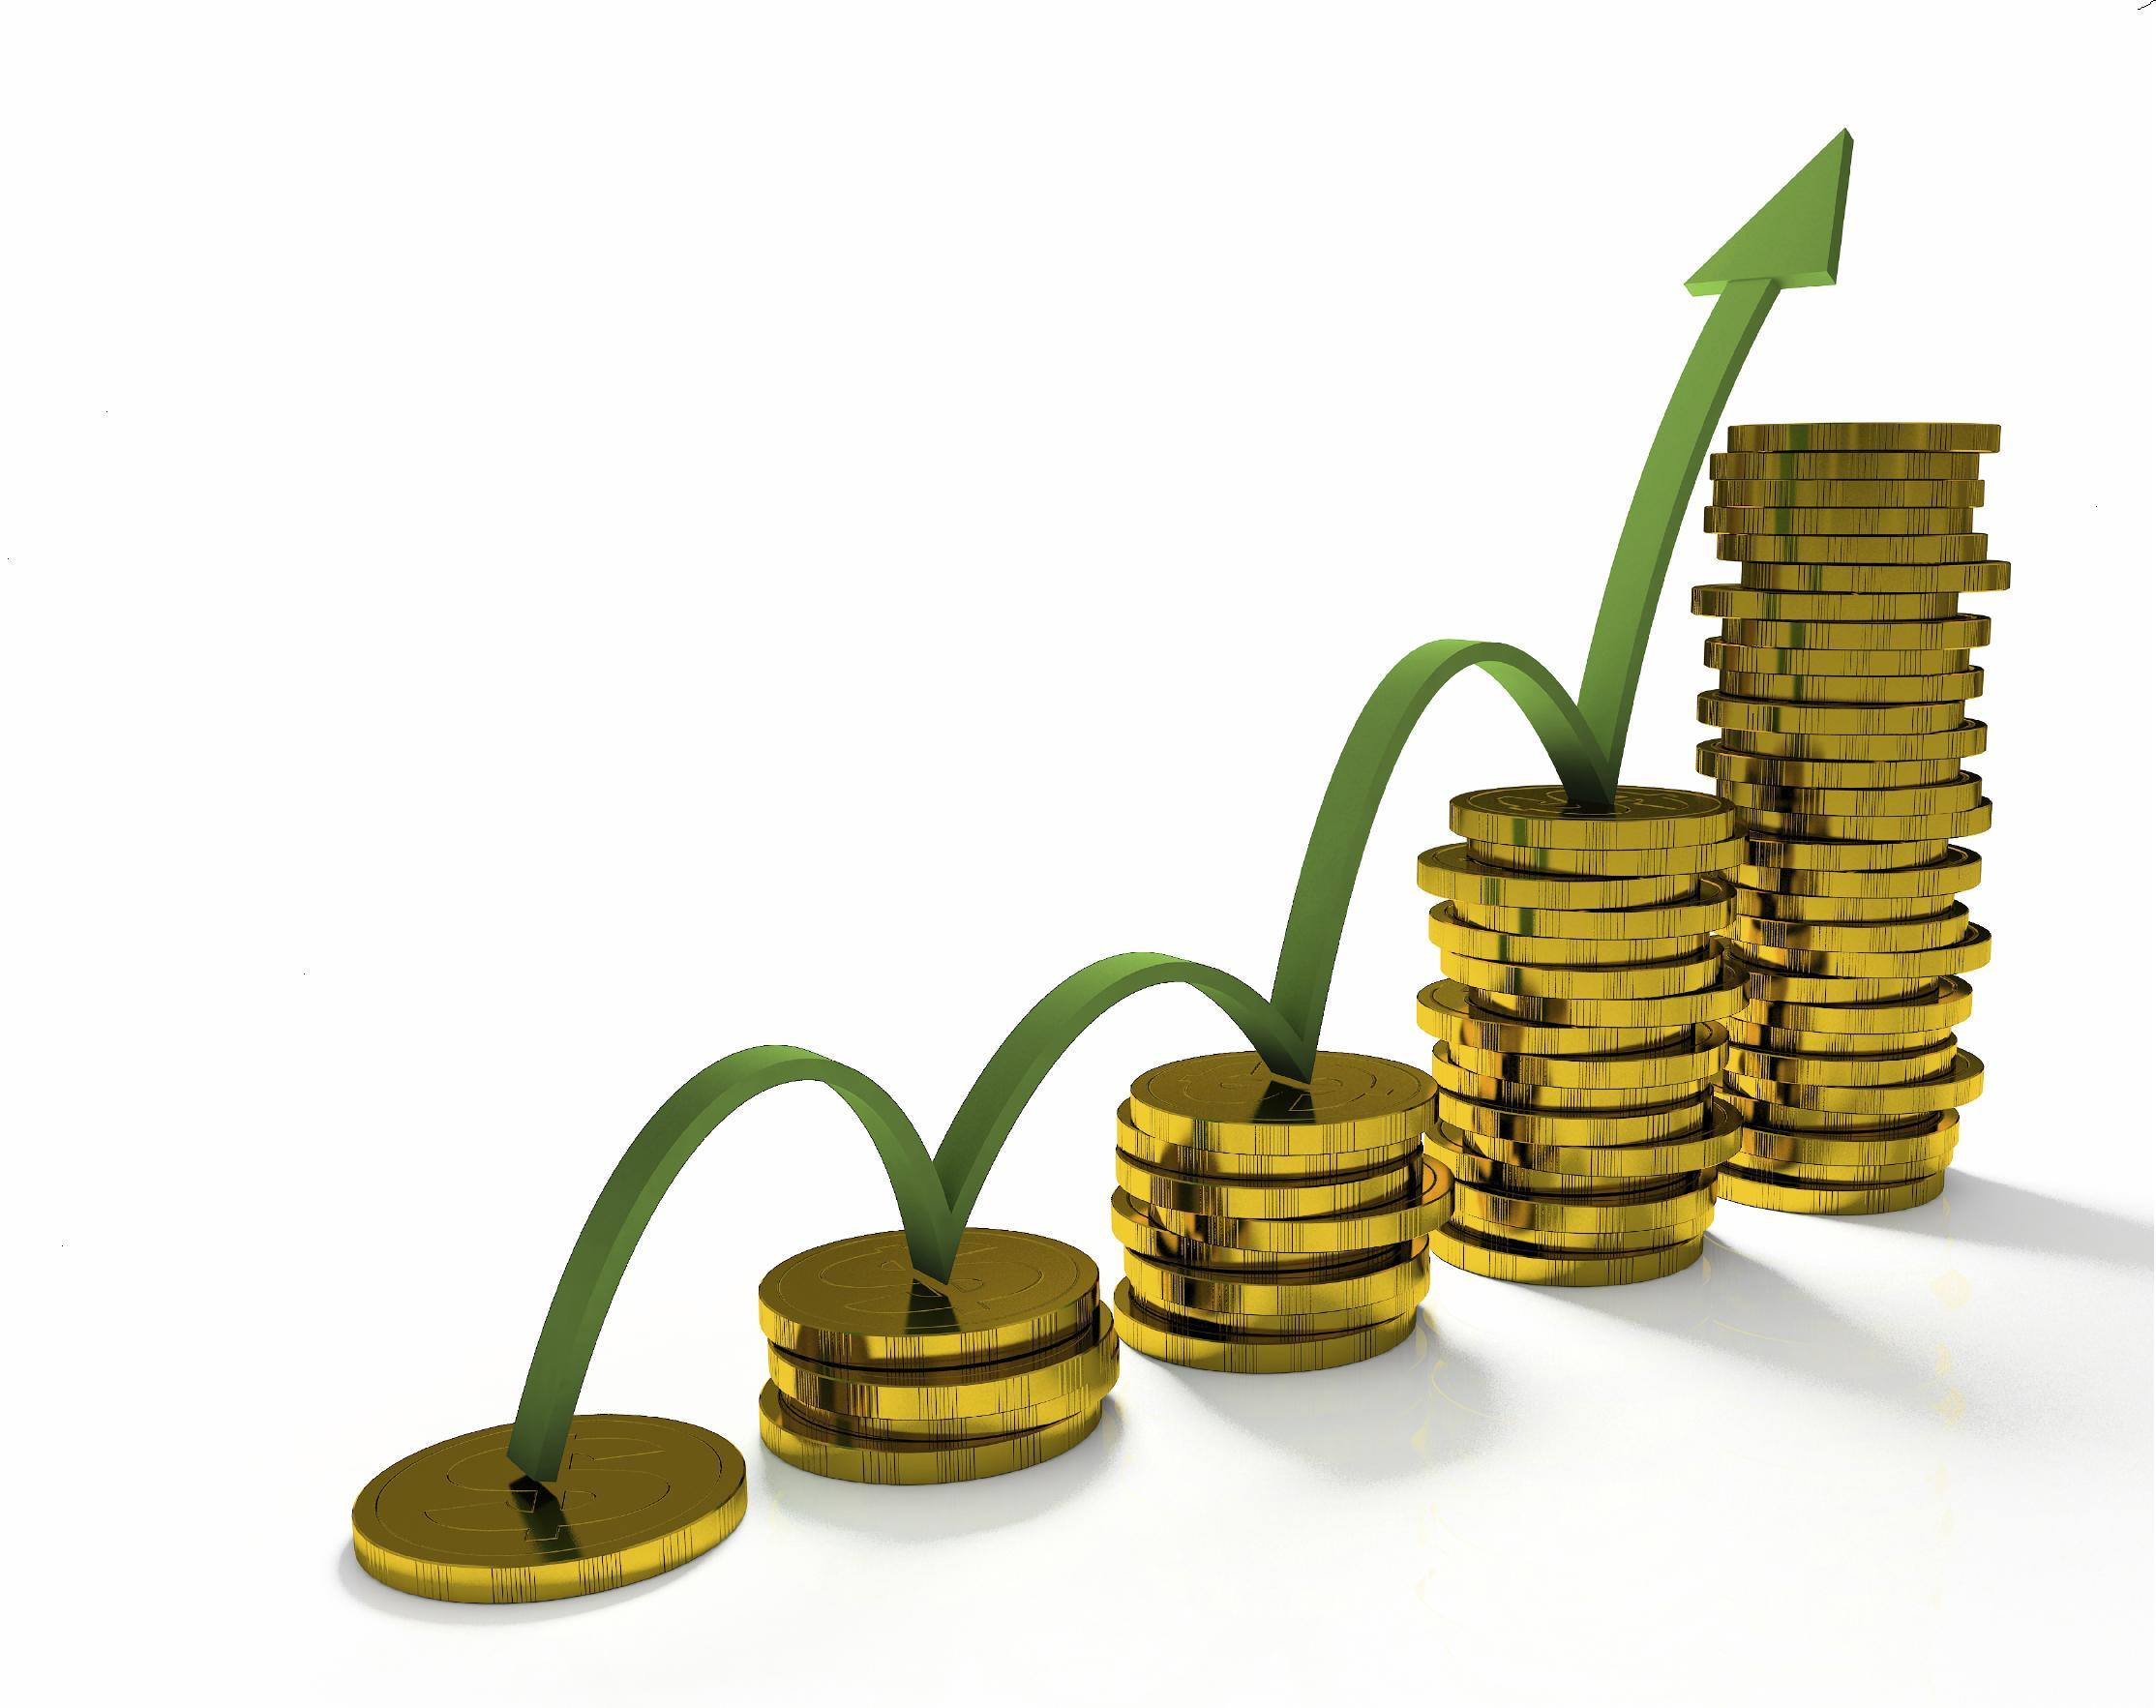 Exim bank may raise $3 billion in FY22